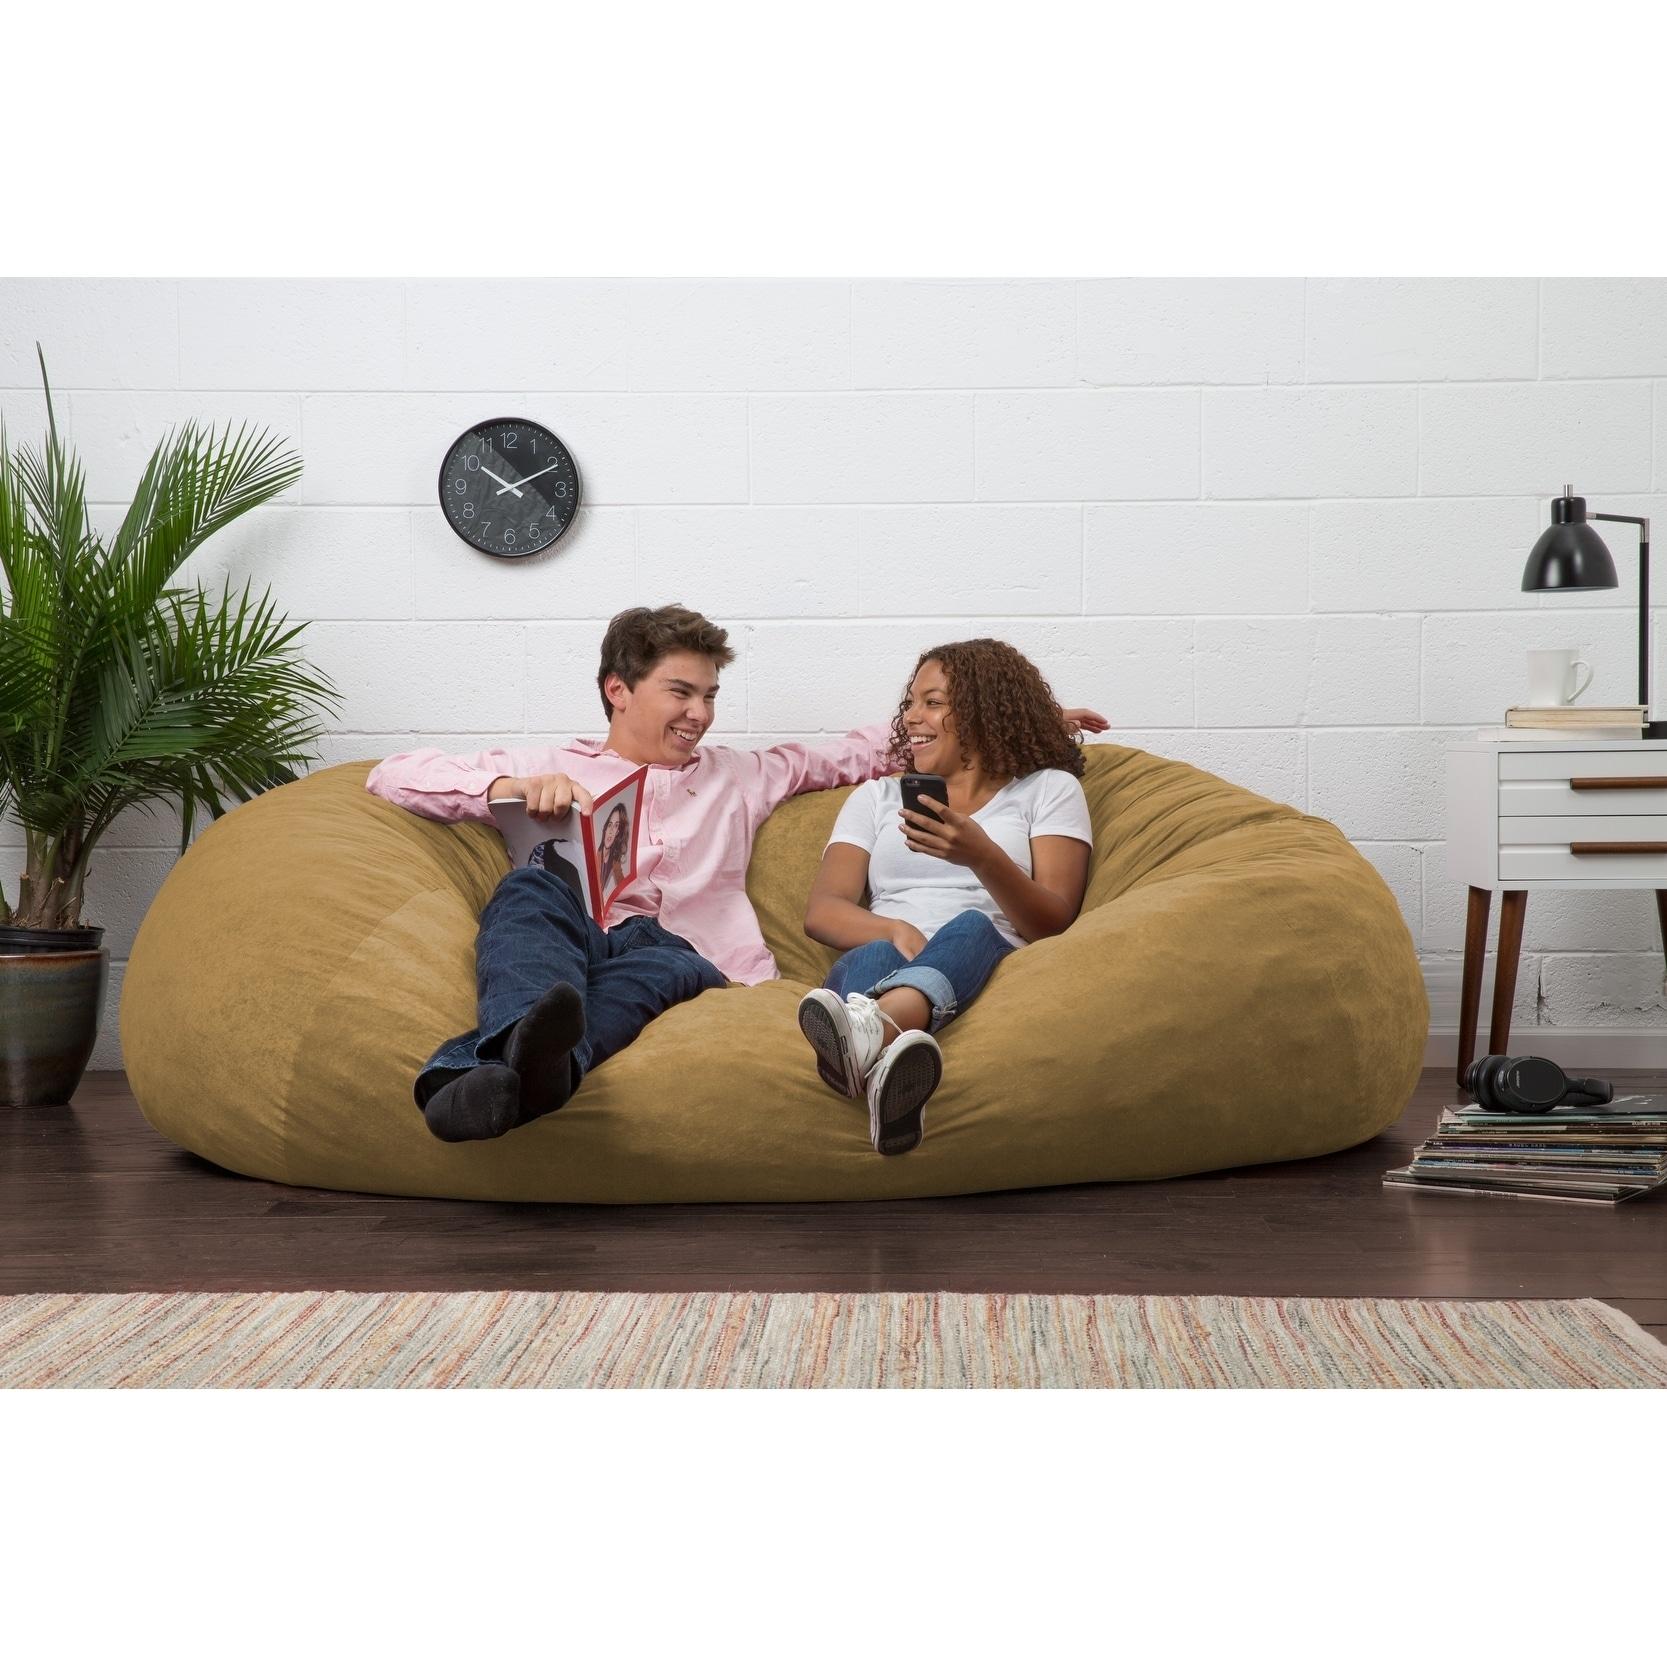 514439f2ba Shop Big Joe XL Bean Bag Fuf Chair - Free Shipping Today - Overstock -  8847096